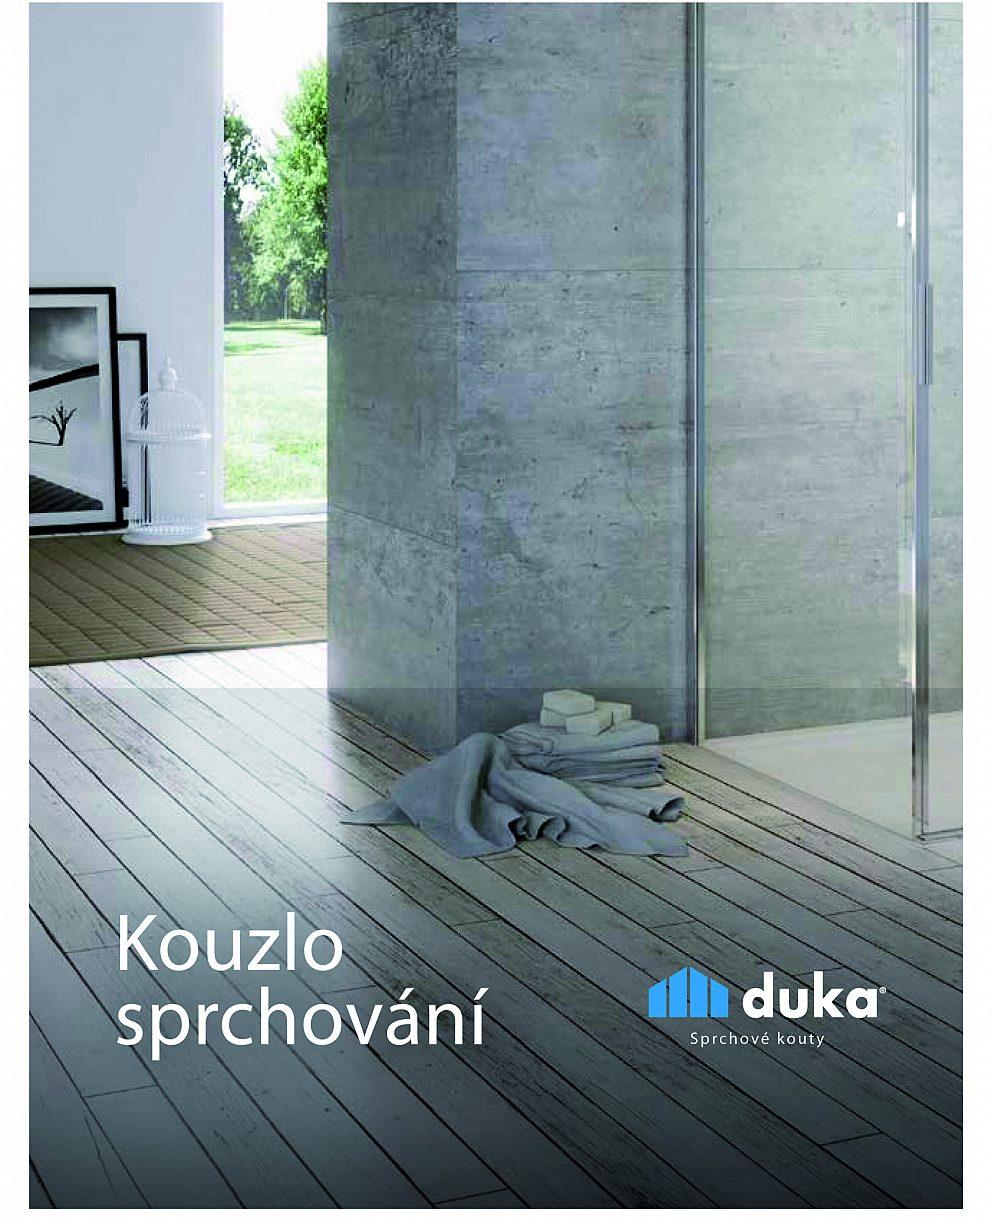 Duka 2018